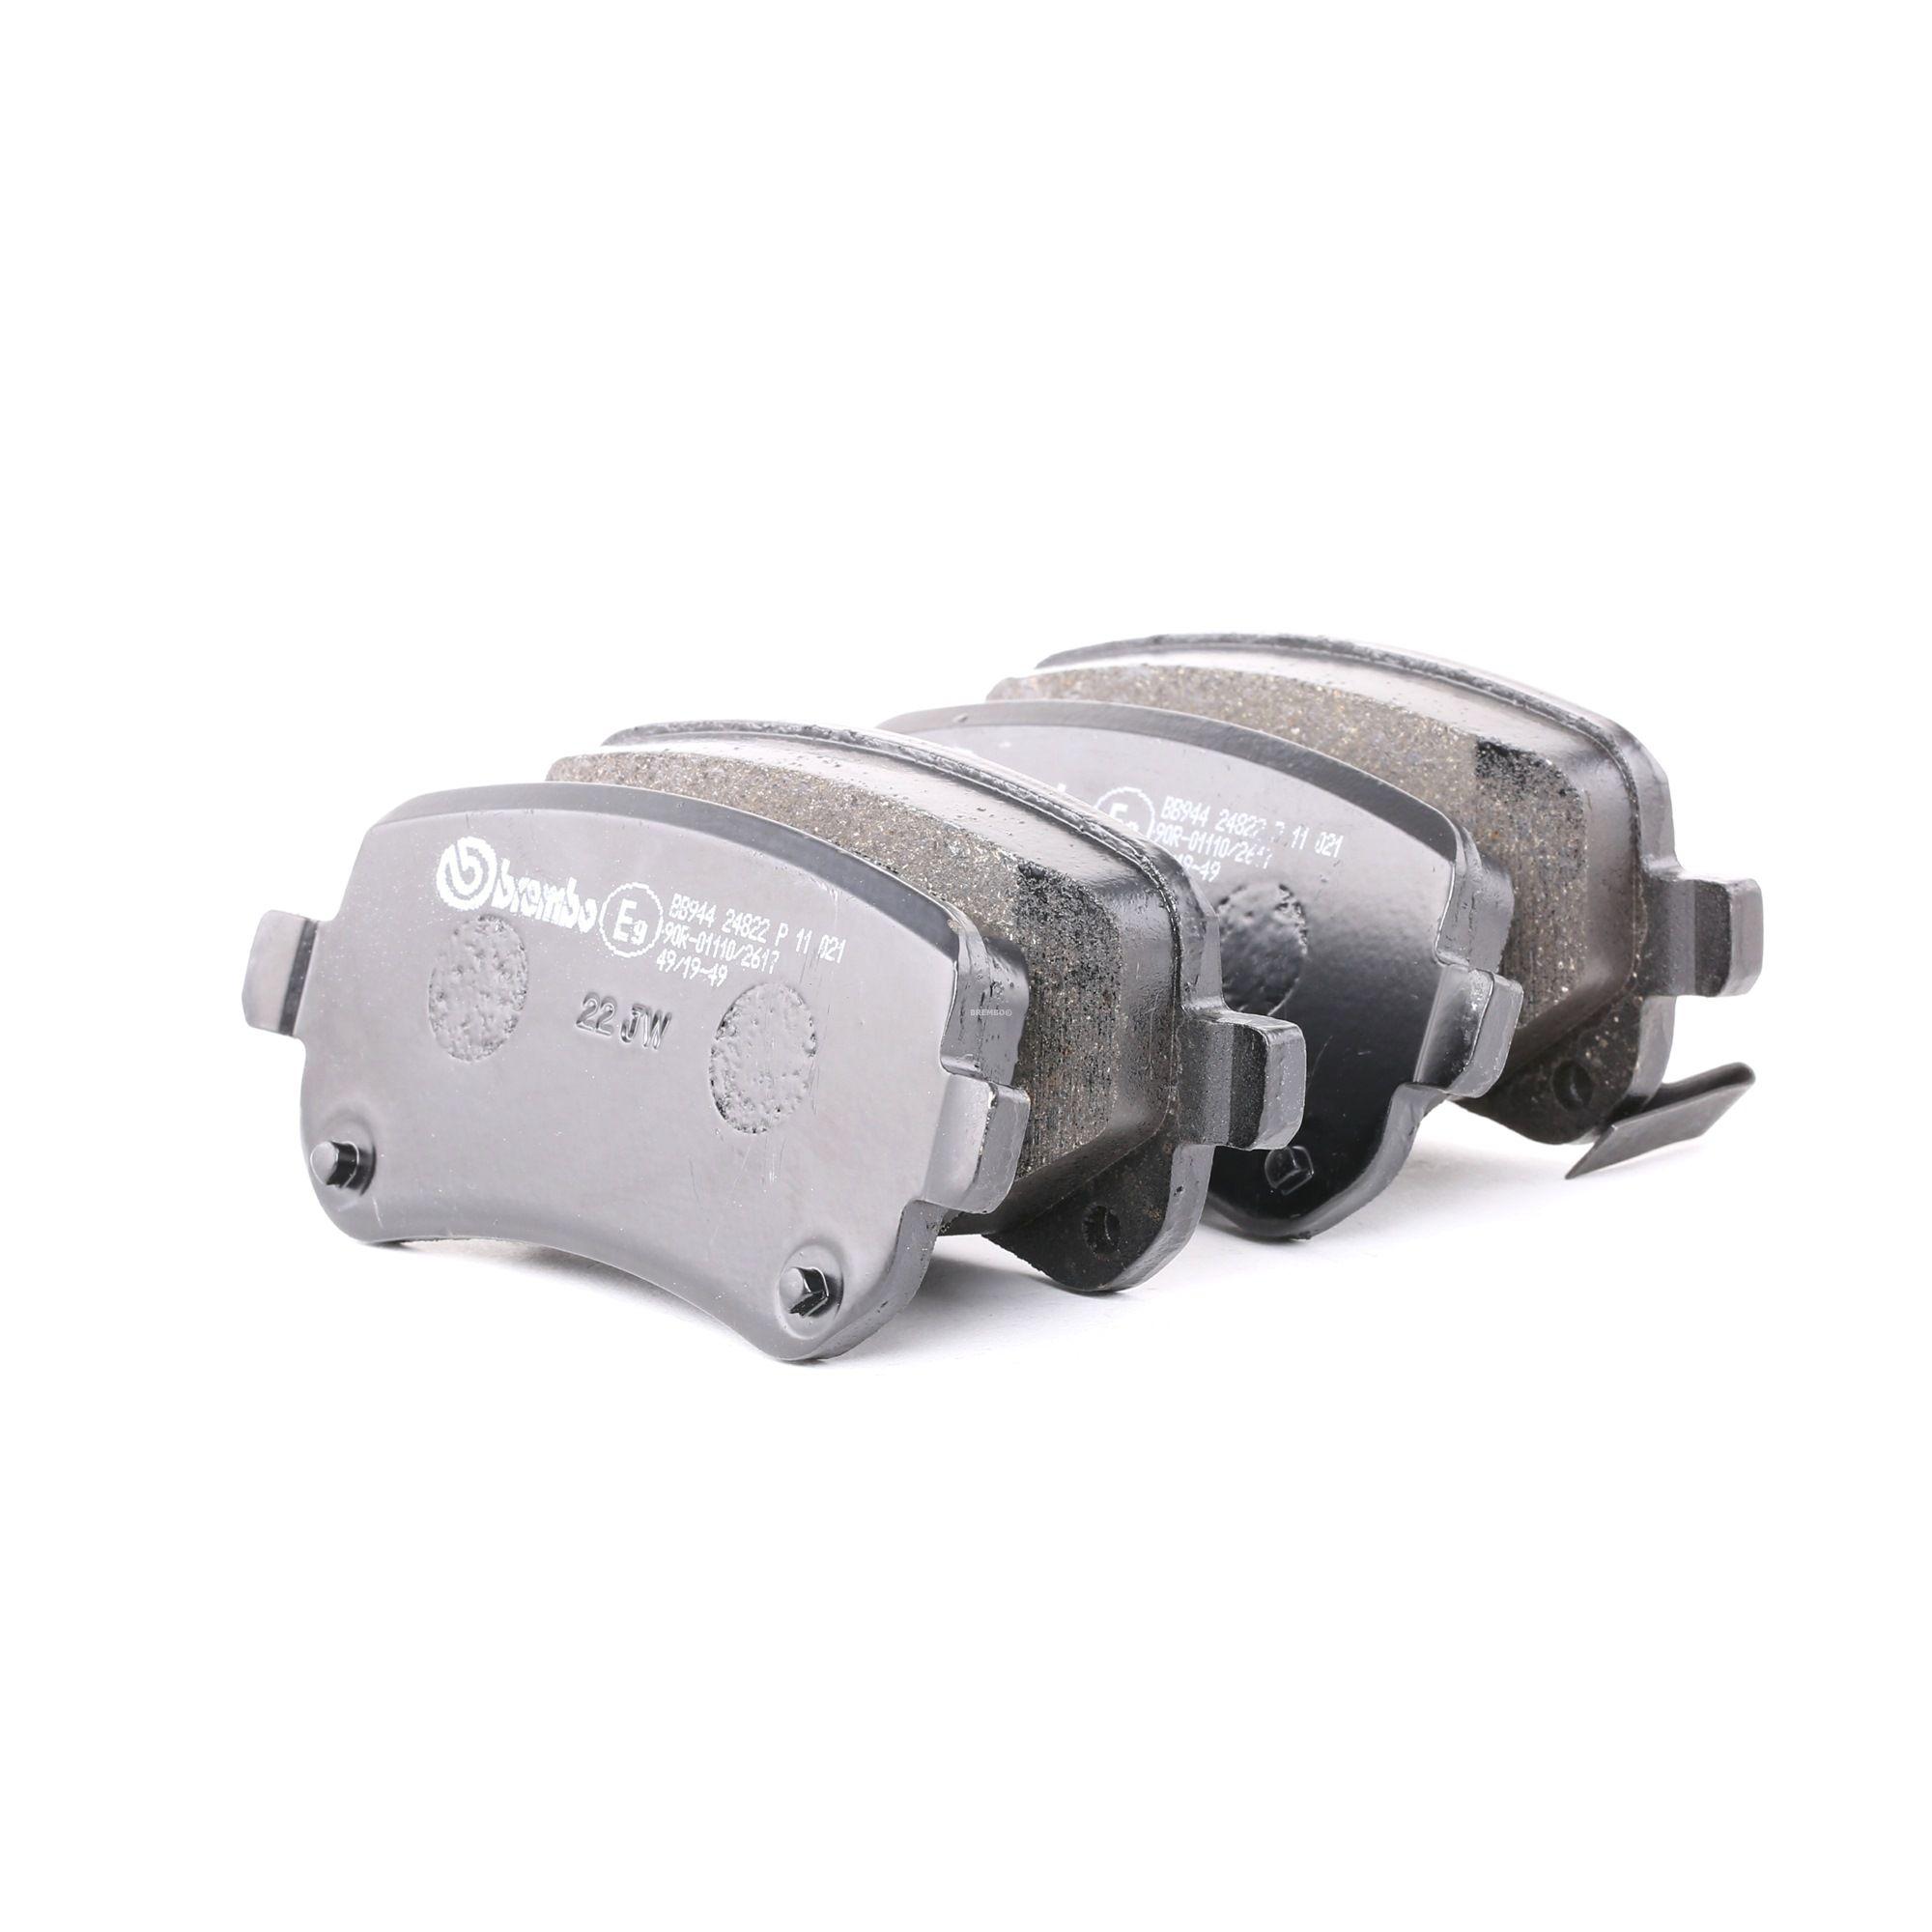 Bremsbelagsatz BREMBO D13268438 Bewertung